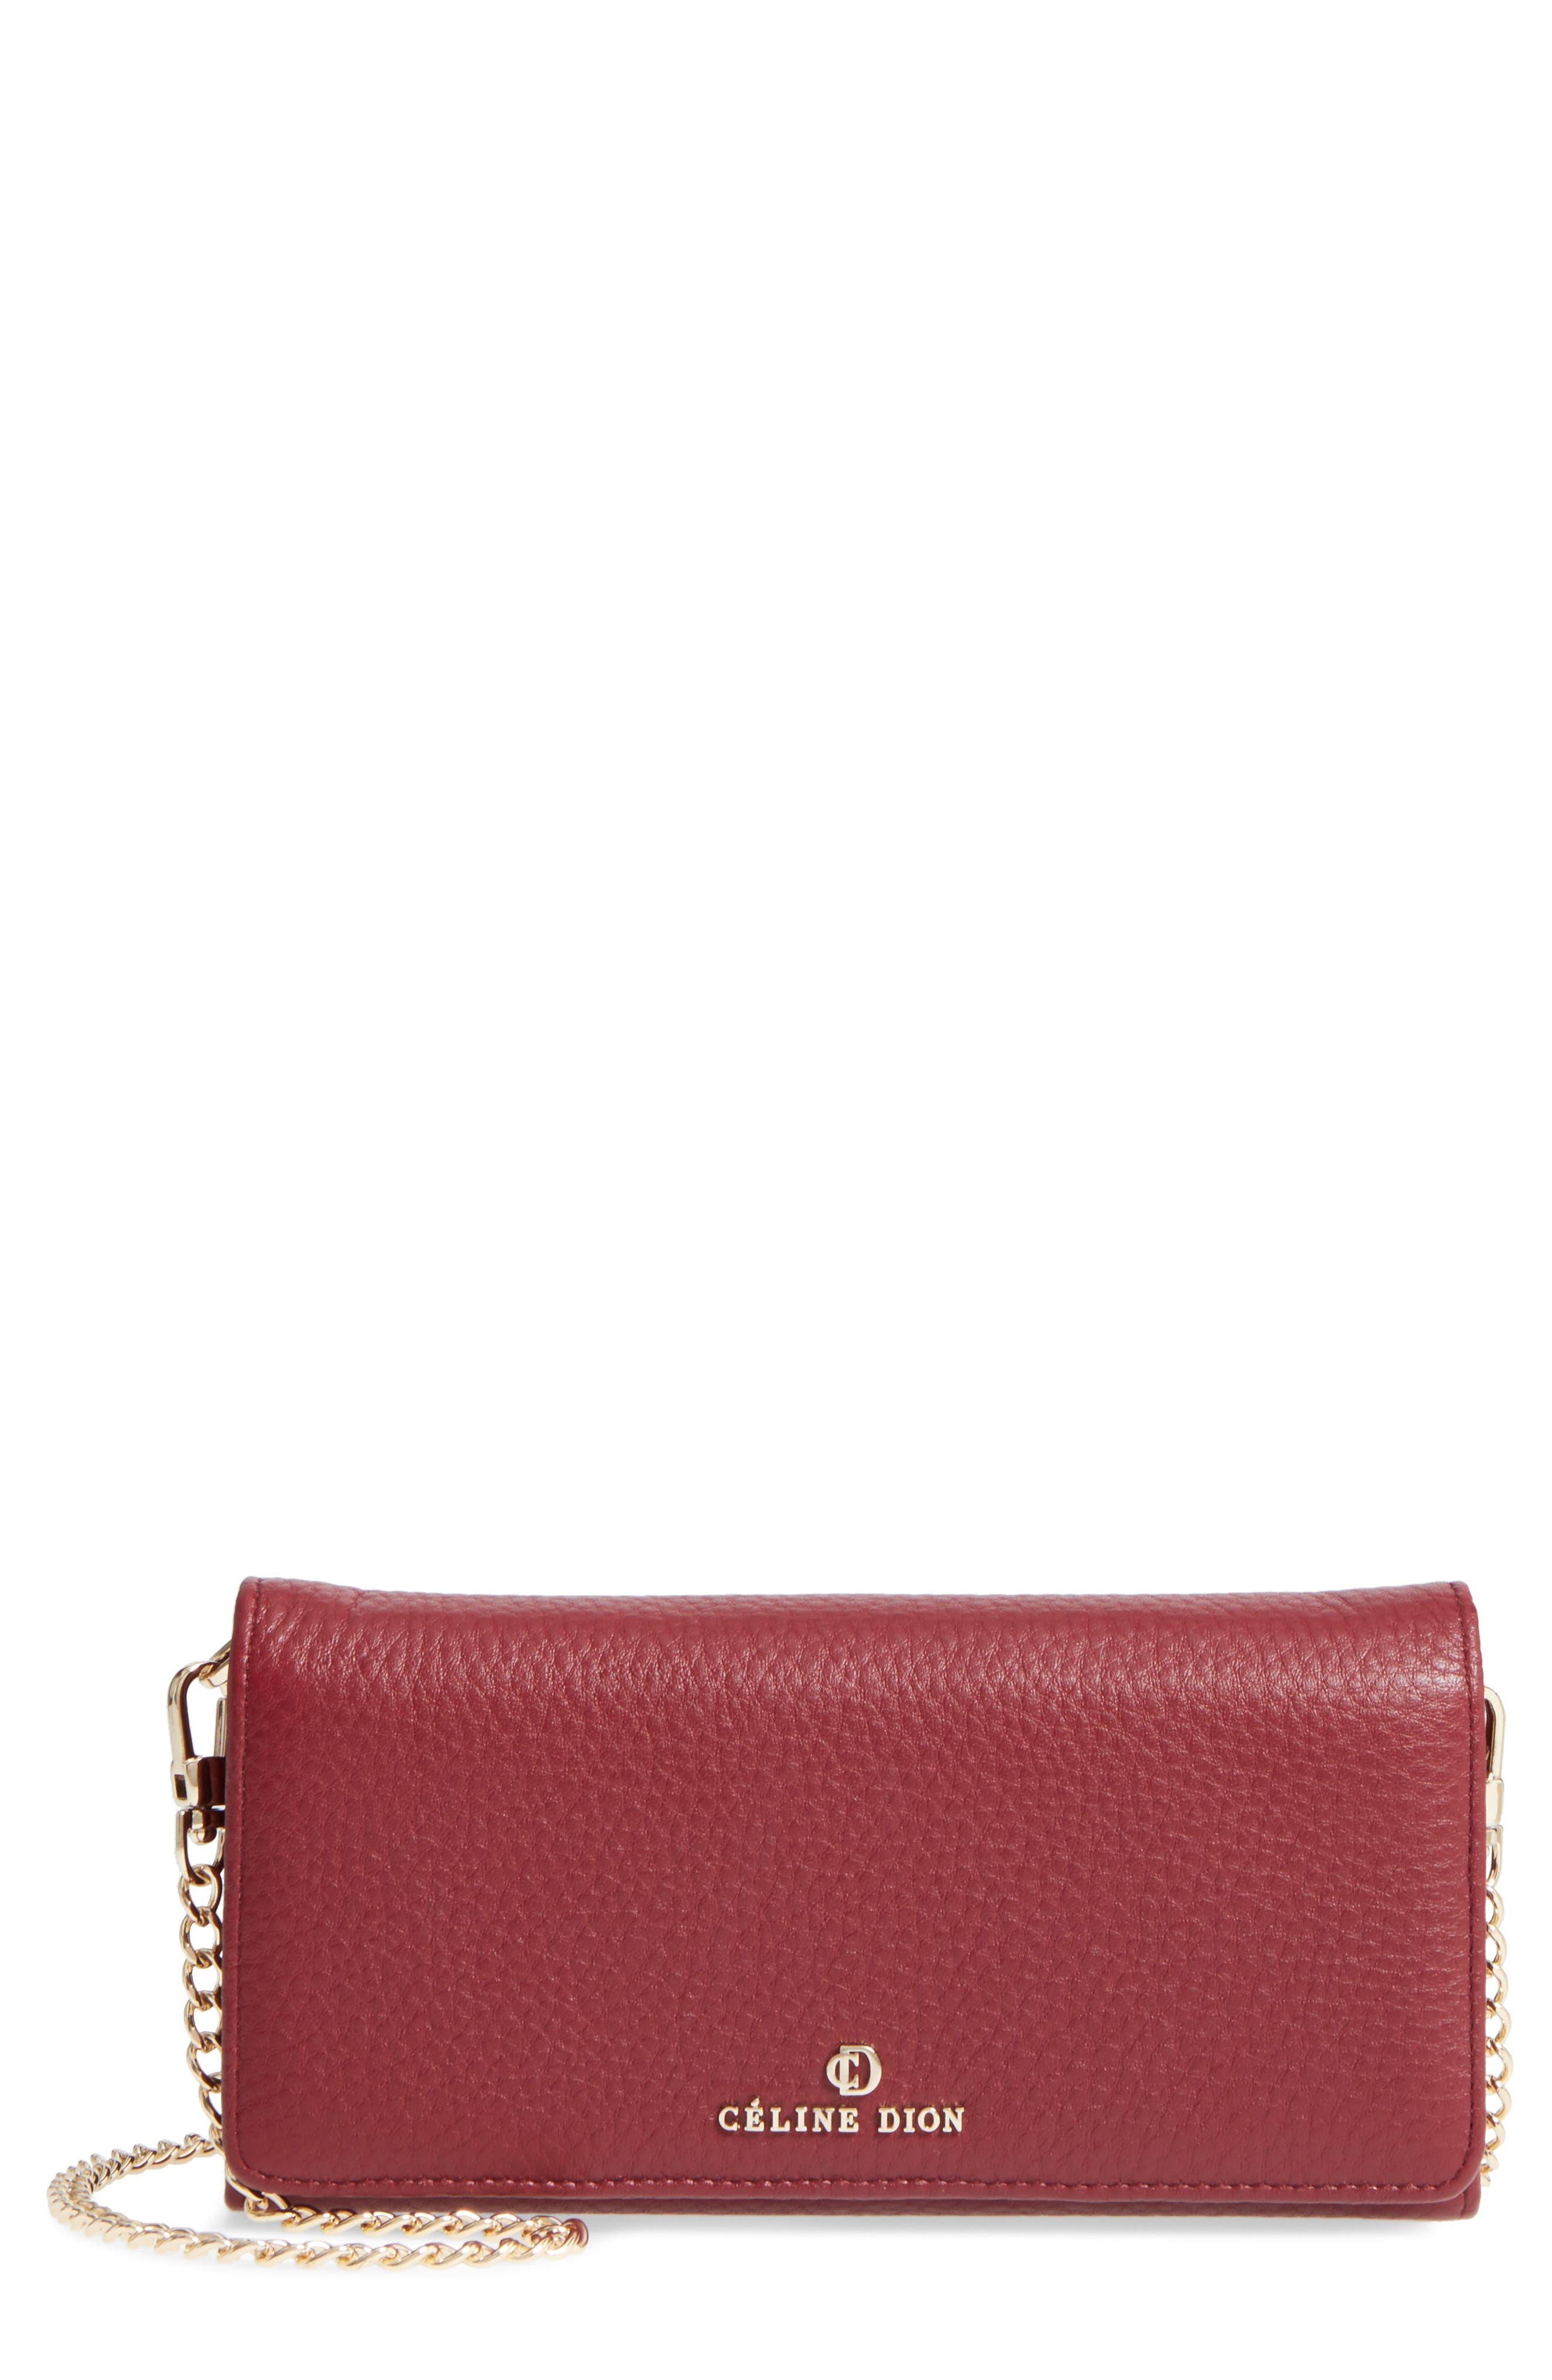 Céline Dion Adagio Leather Crossbody Wallet,                         Main,                         color, Dark Red